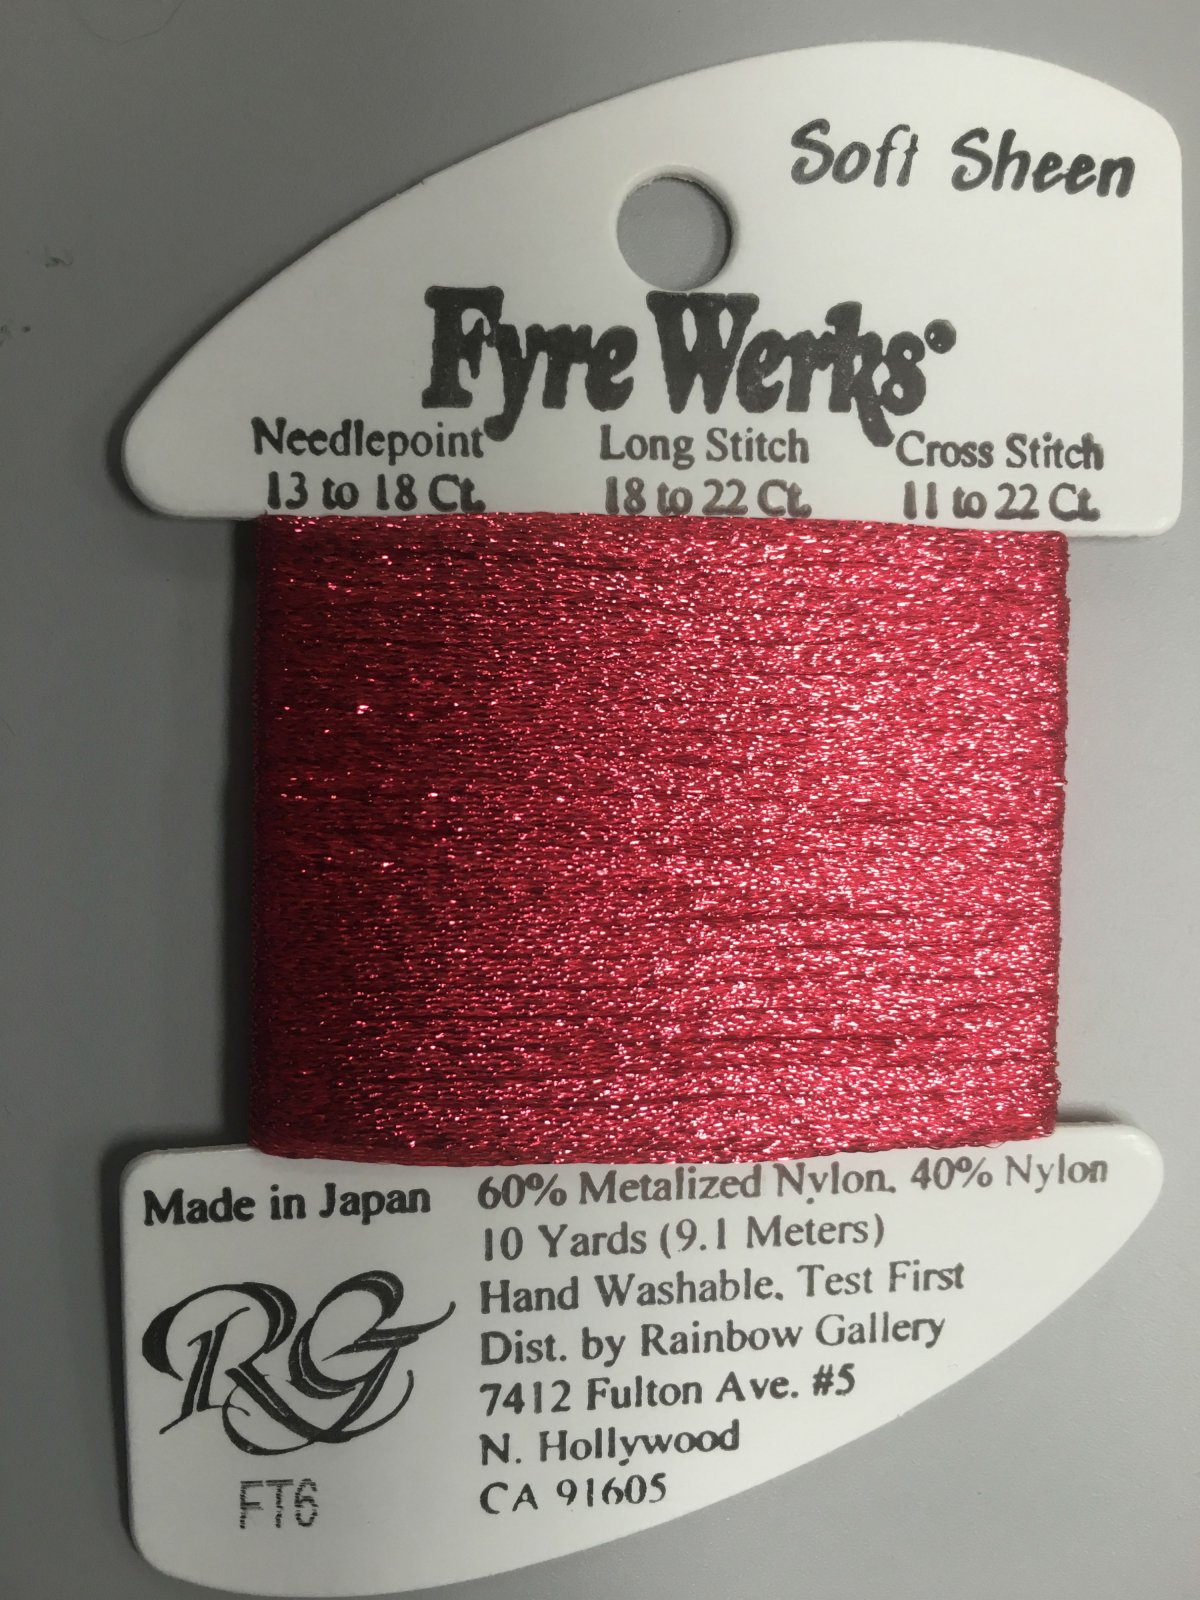 Fyre Werks Soft Sheen FT6